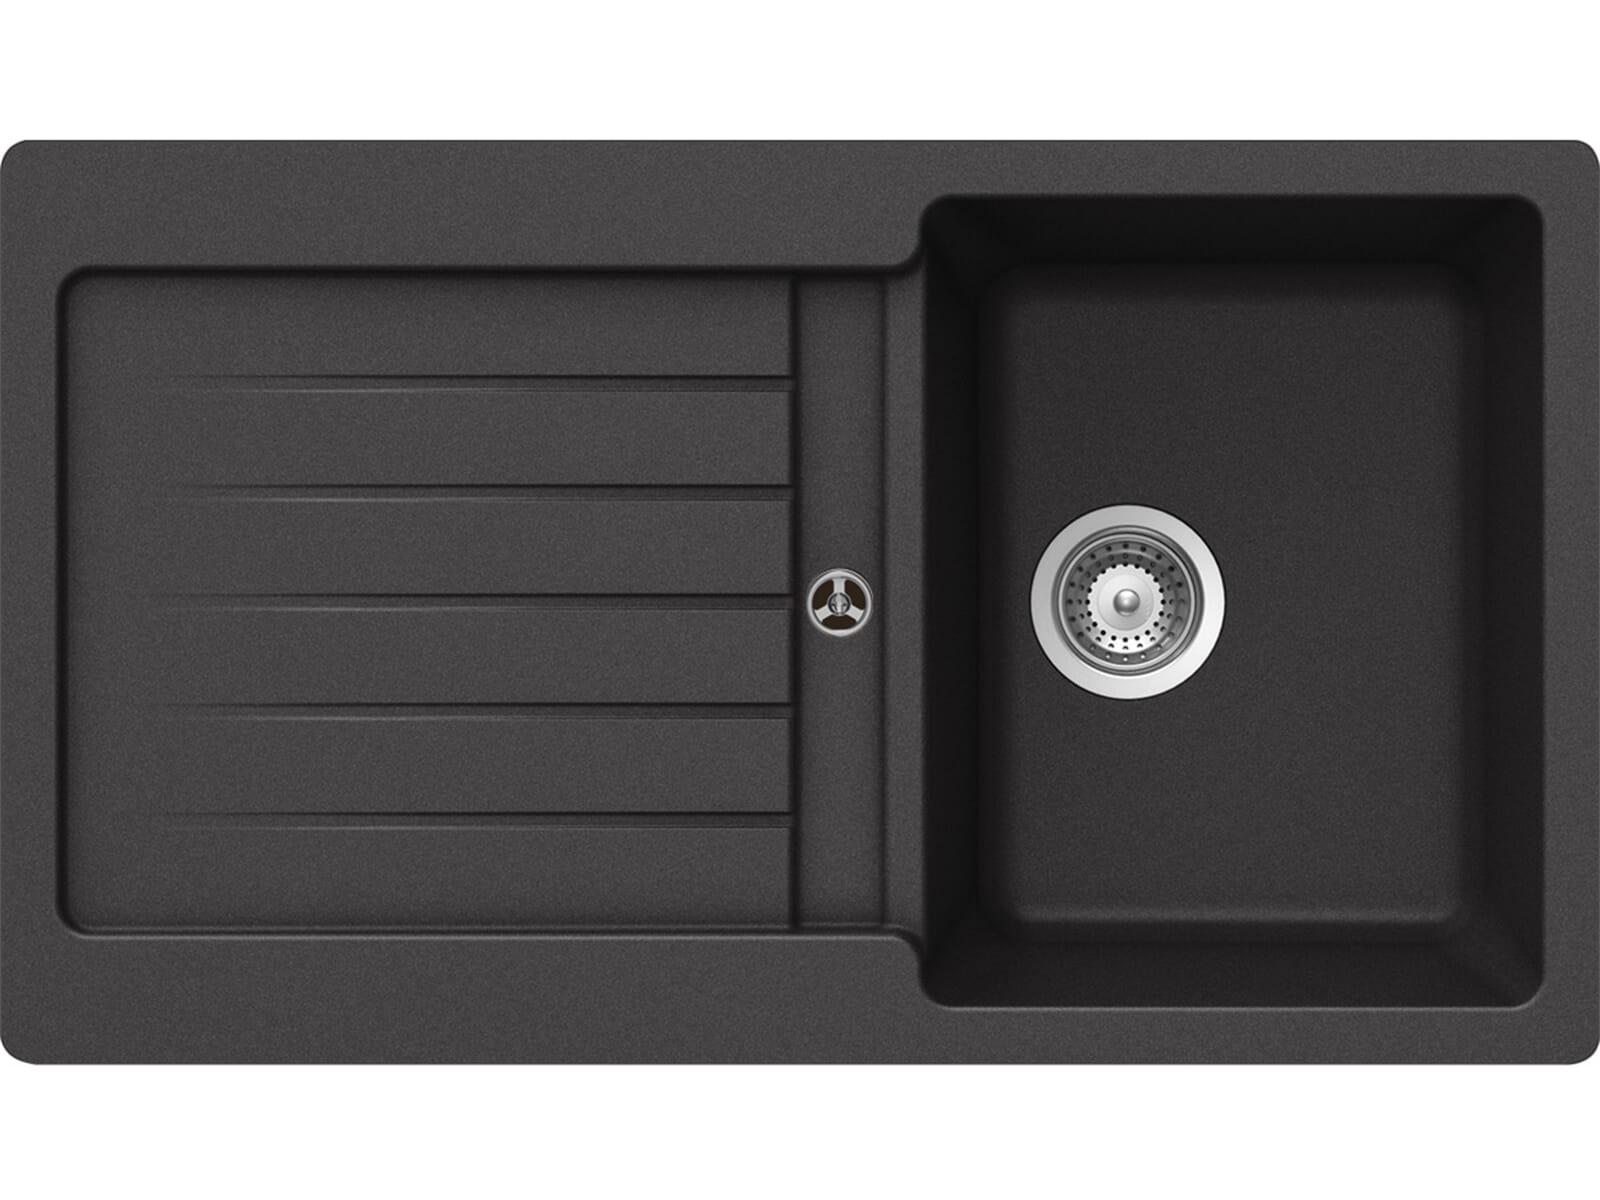 Schock Typos D-100 A Nero - TYPD100AGNE Granitspüle